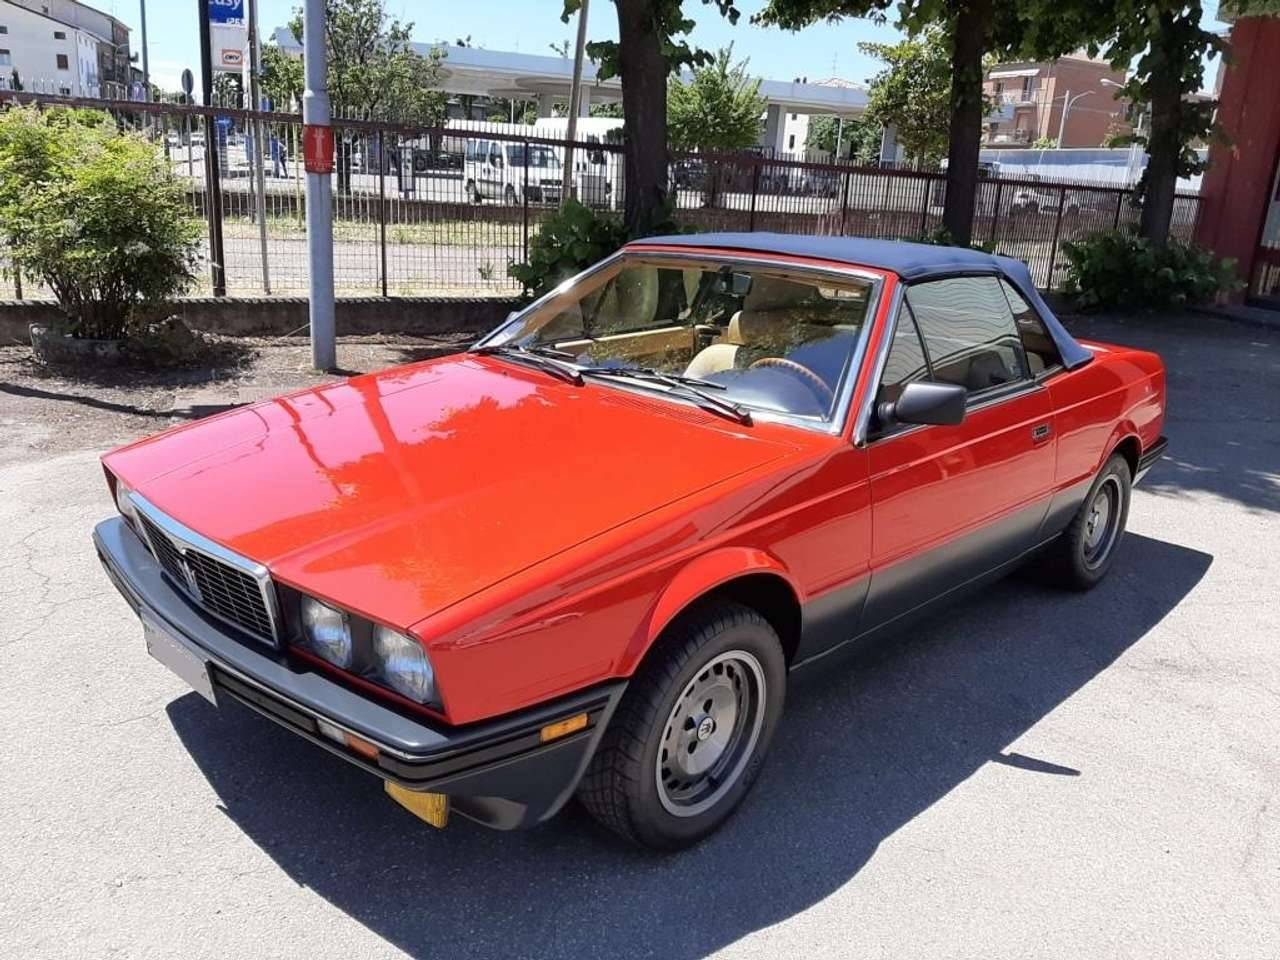 For Sale: Maserati Biturbo Spyder (1985) offered for AUD ...